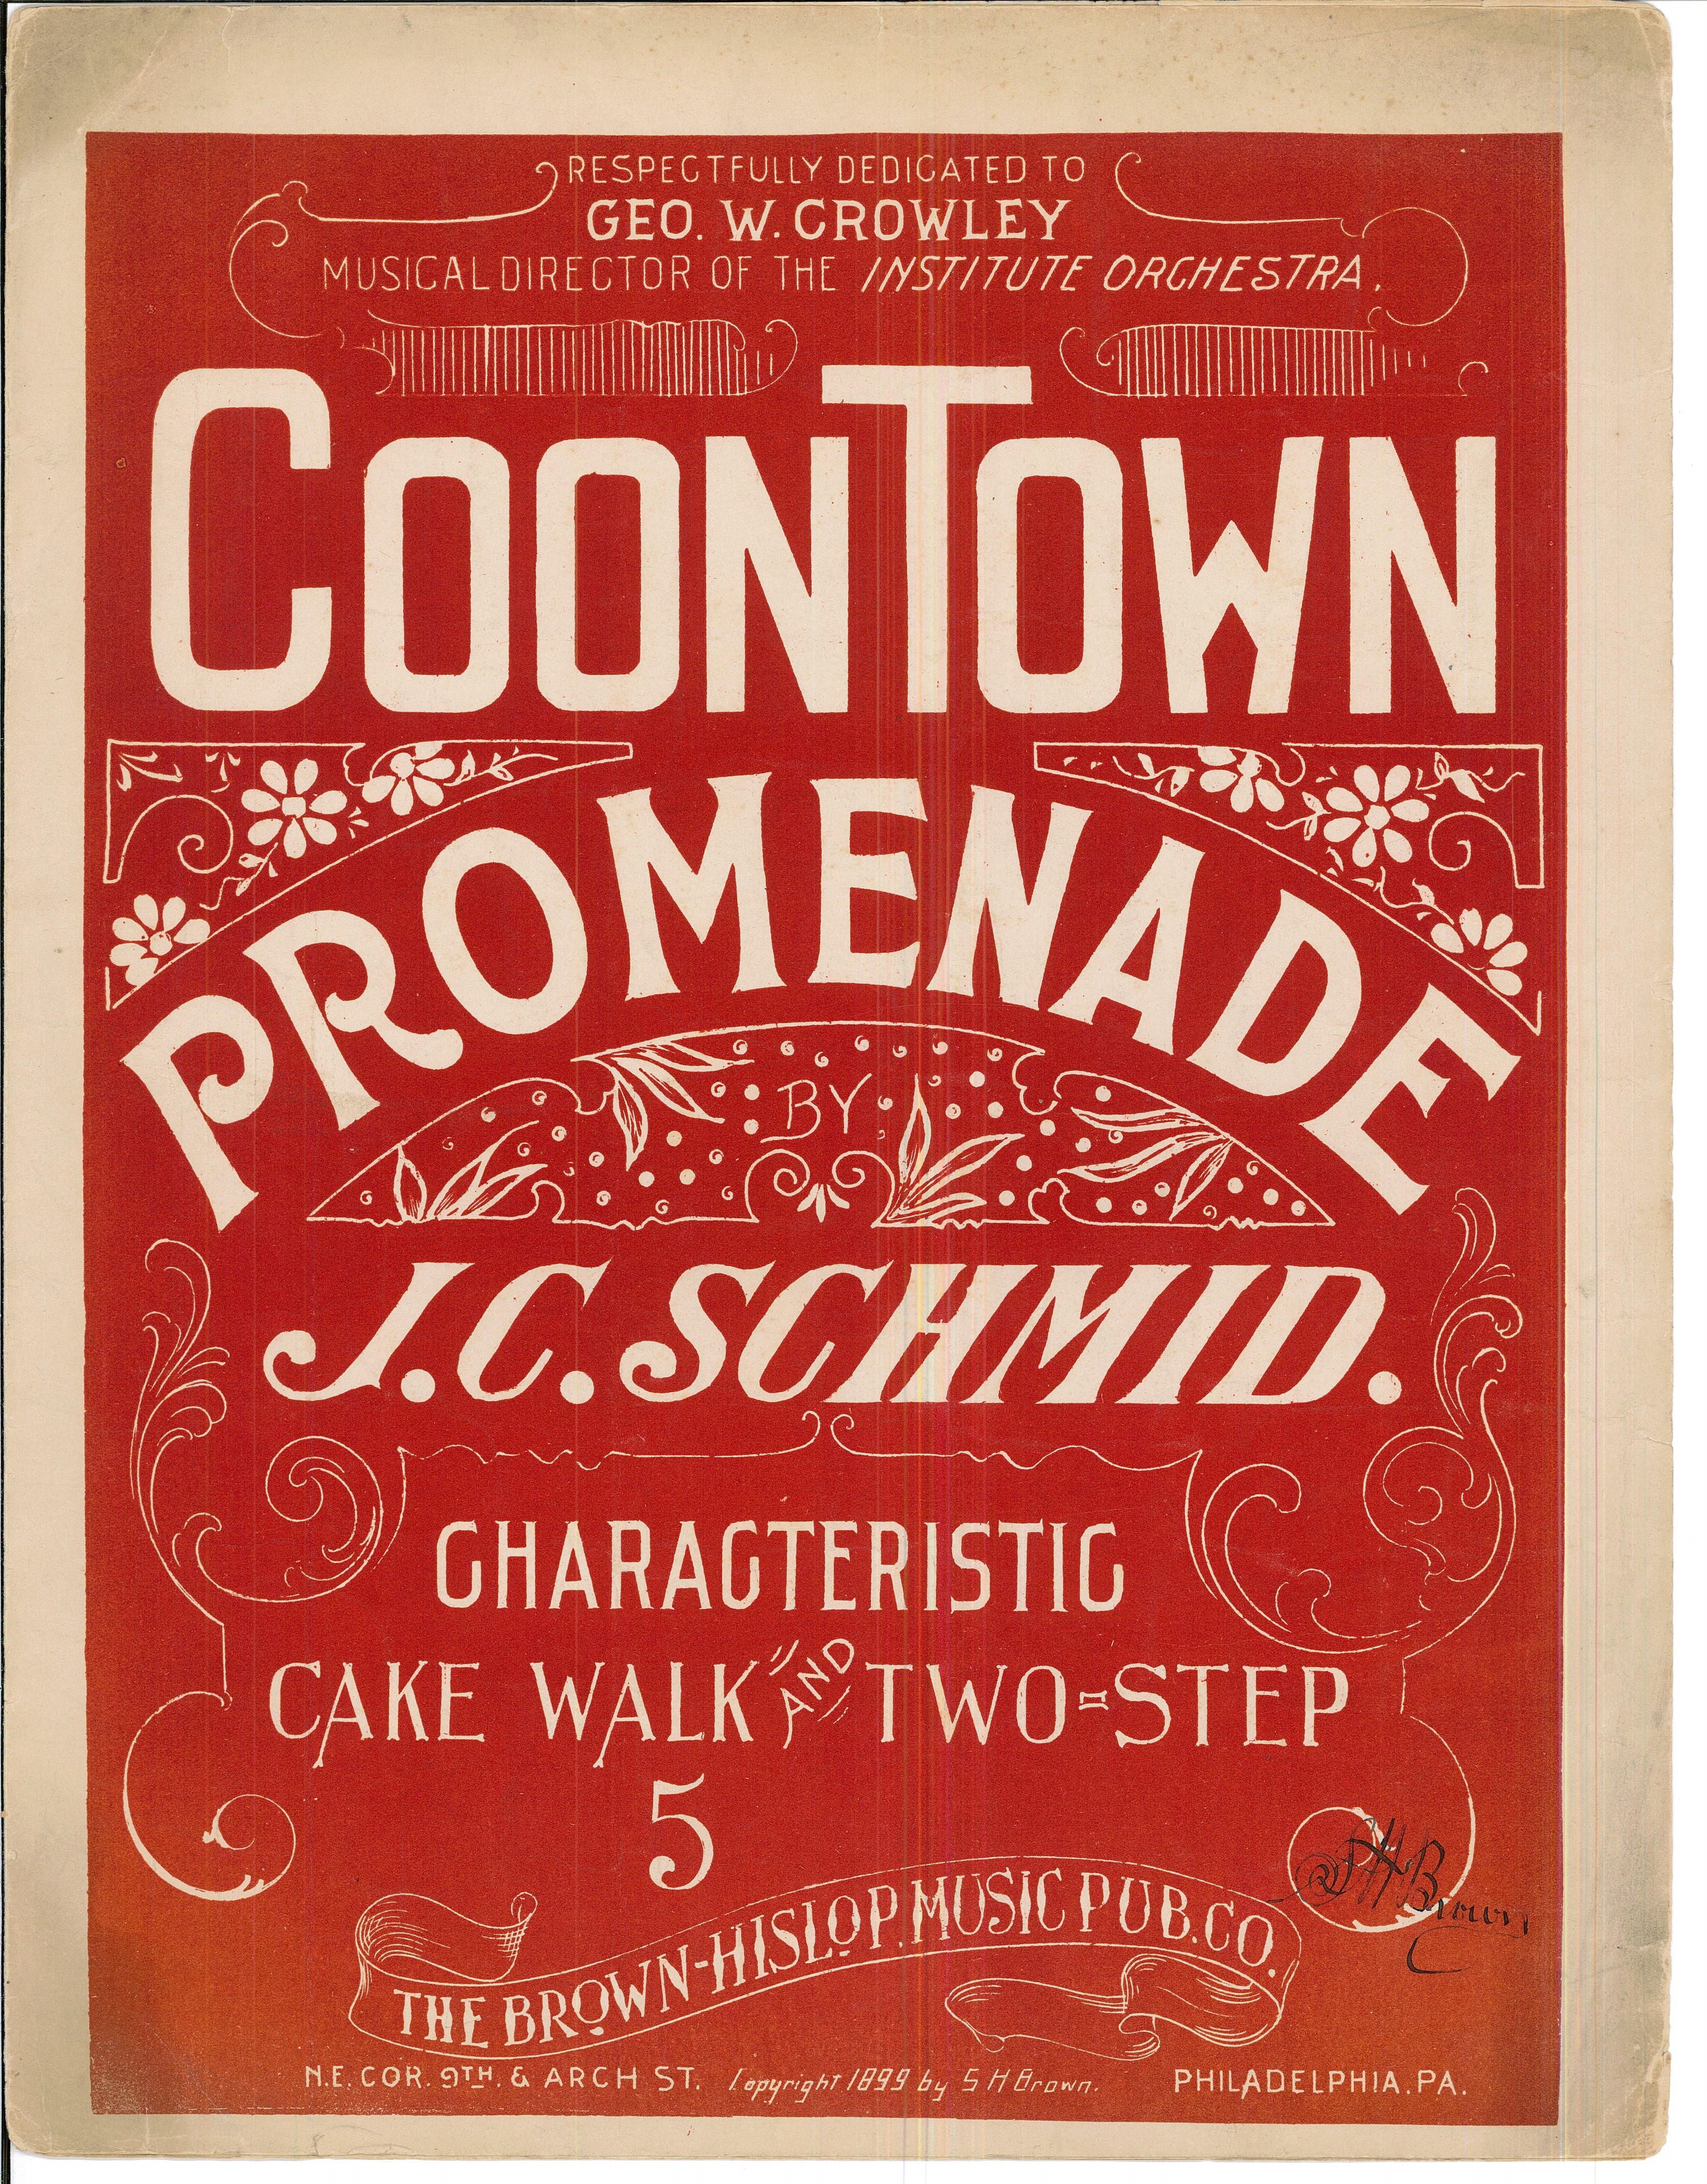 coontown promenade